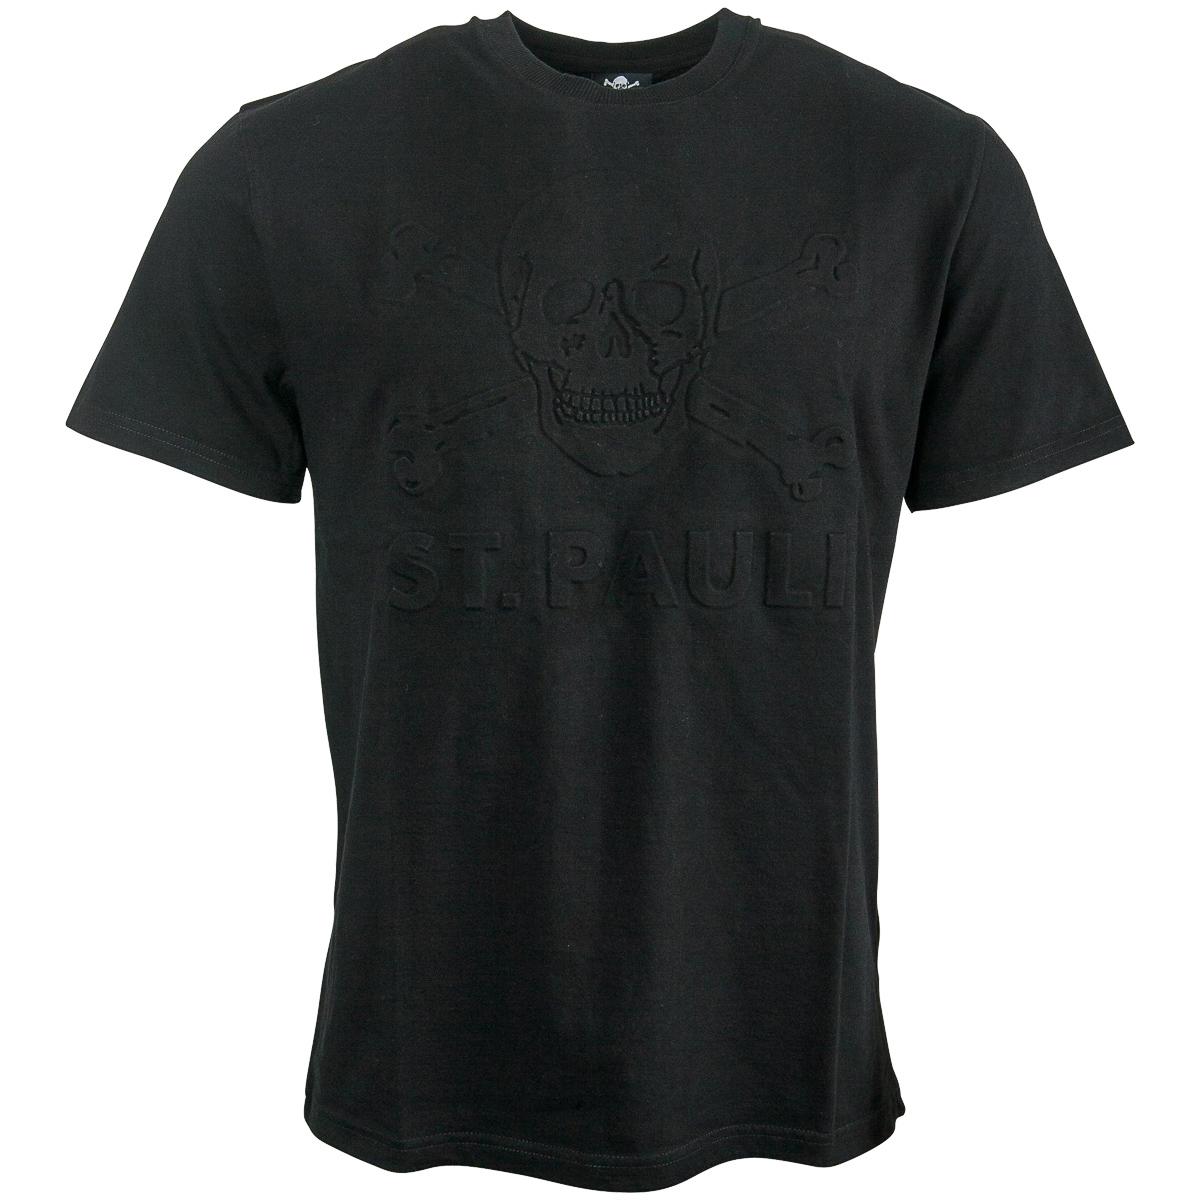 FC St. Pauli - T-Shirt 3D Black 2019 - schwarz